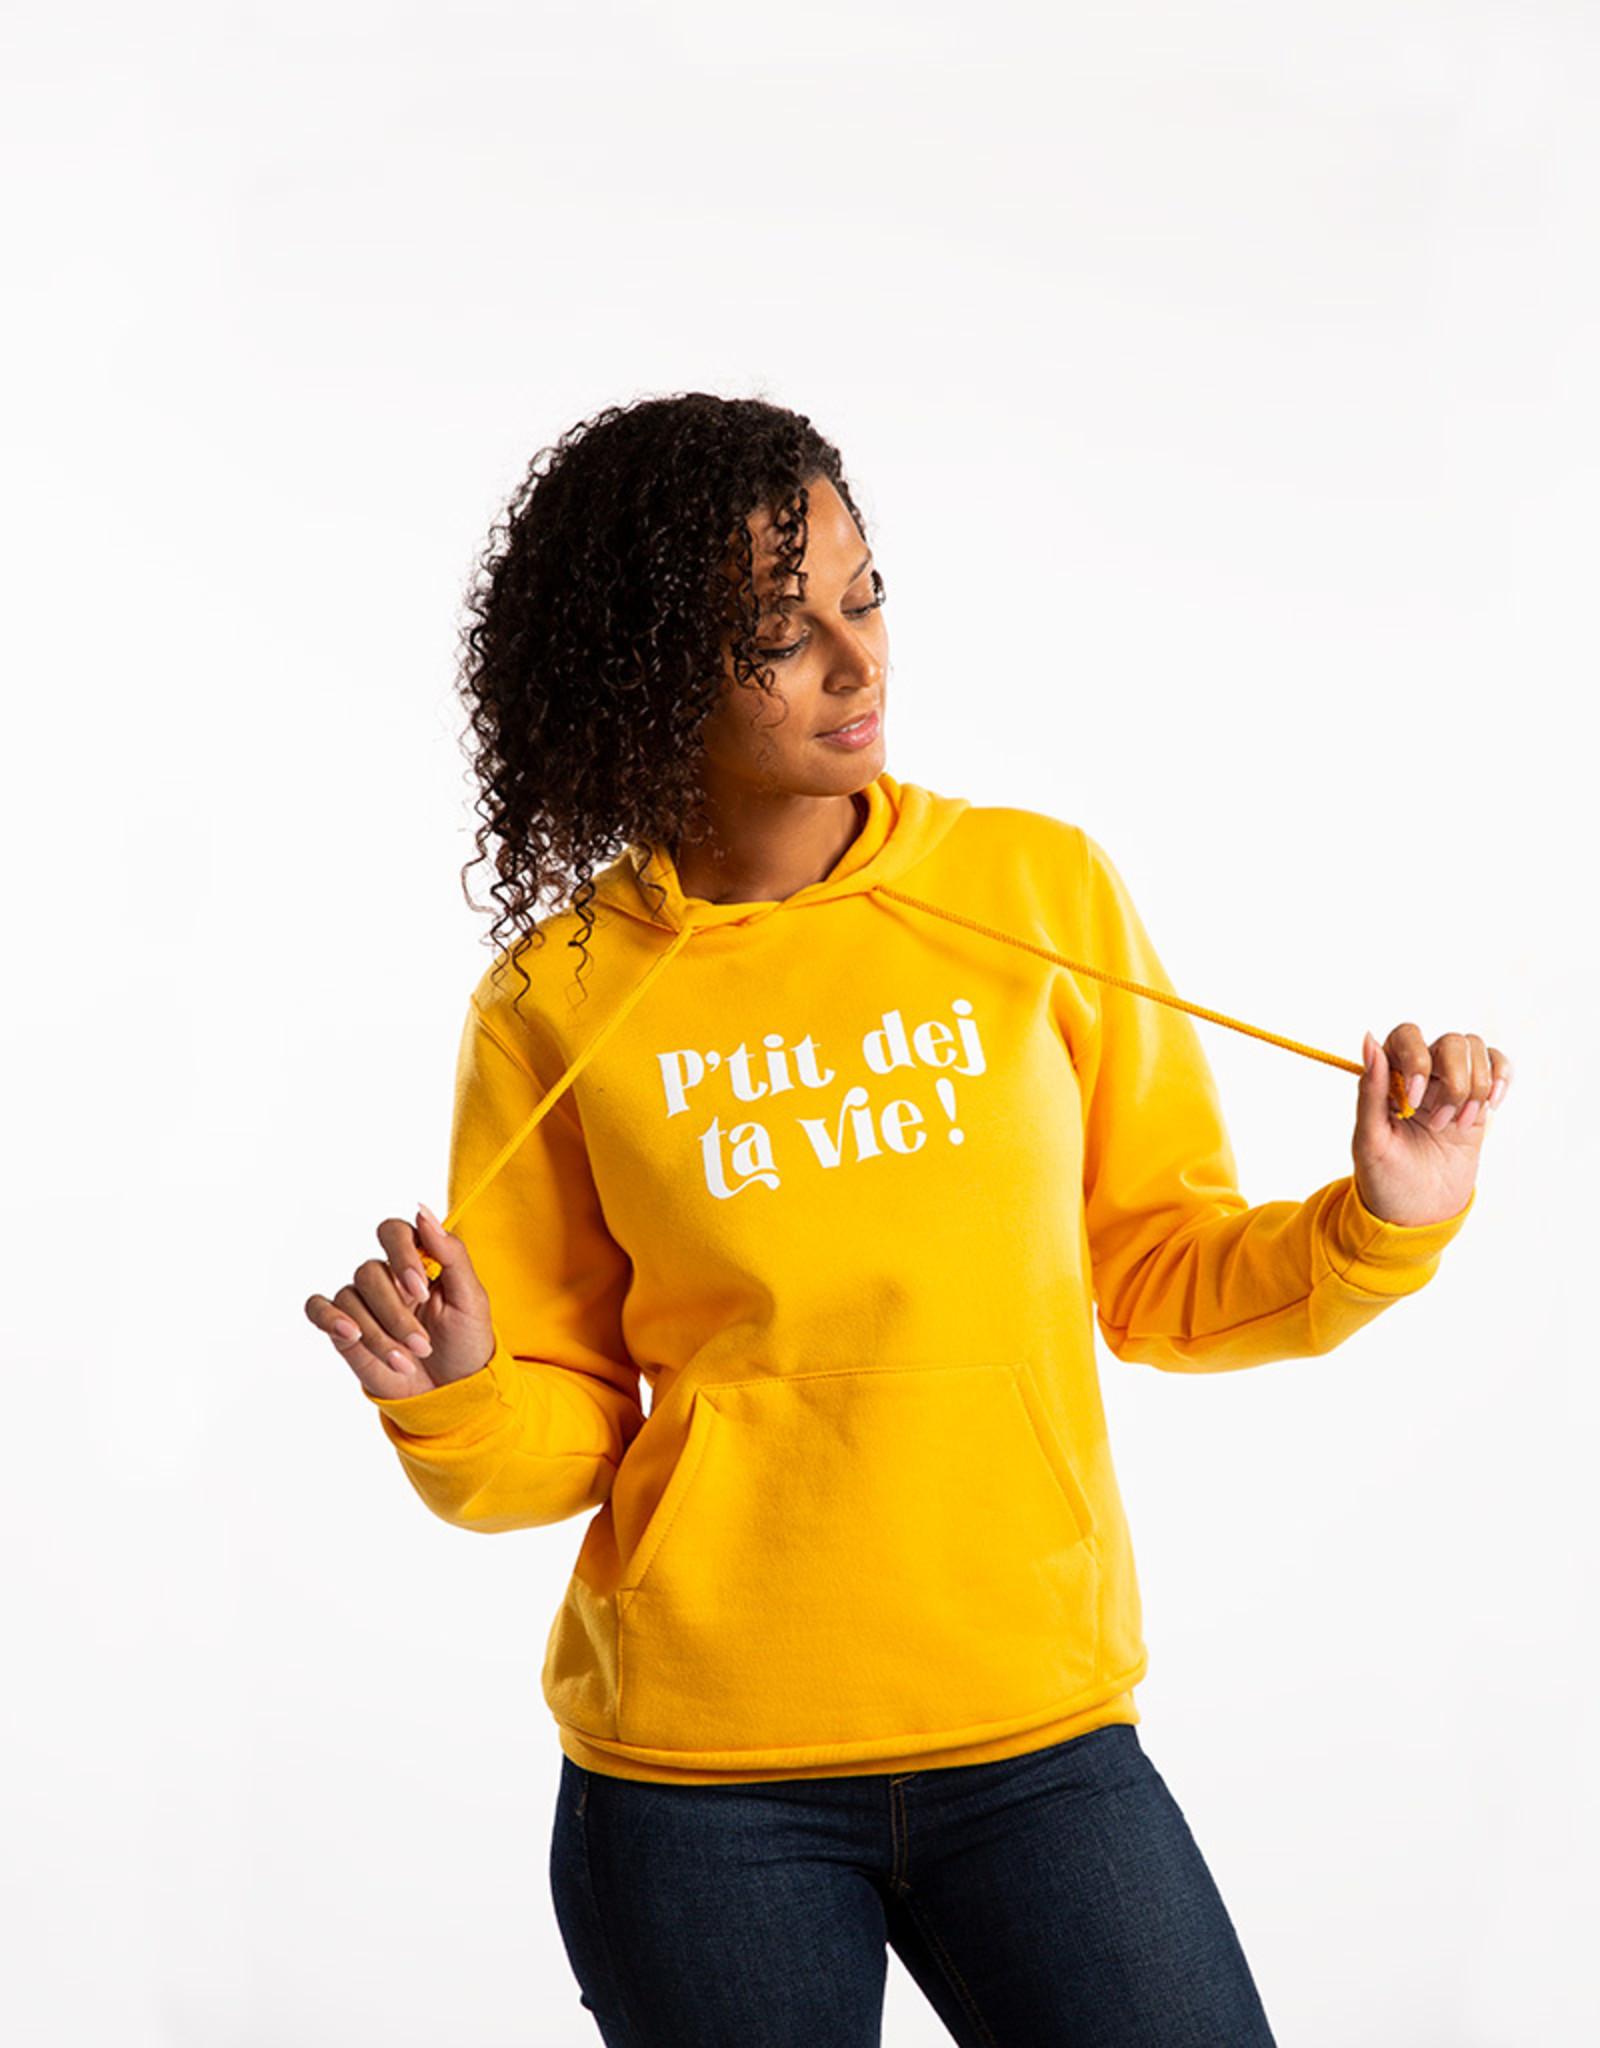 Hoodie – P'tit dej ta vie ! – Yellow